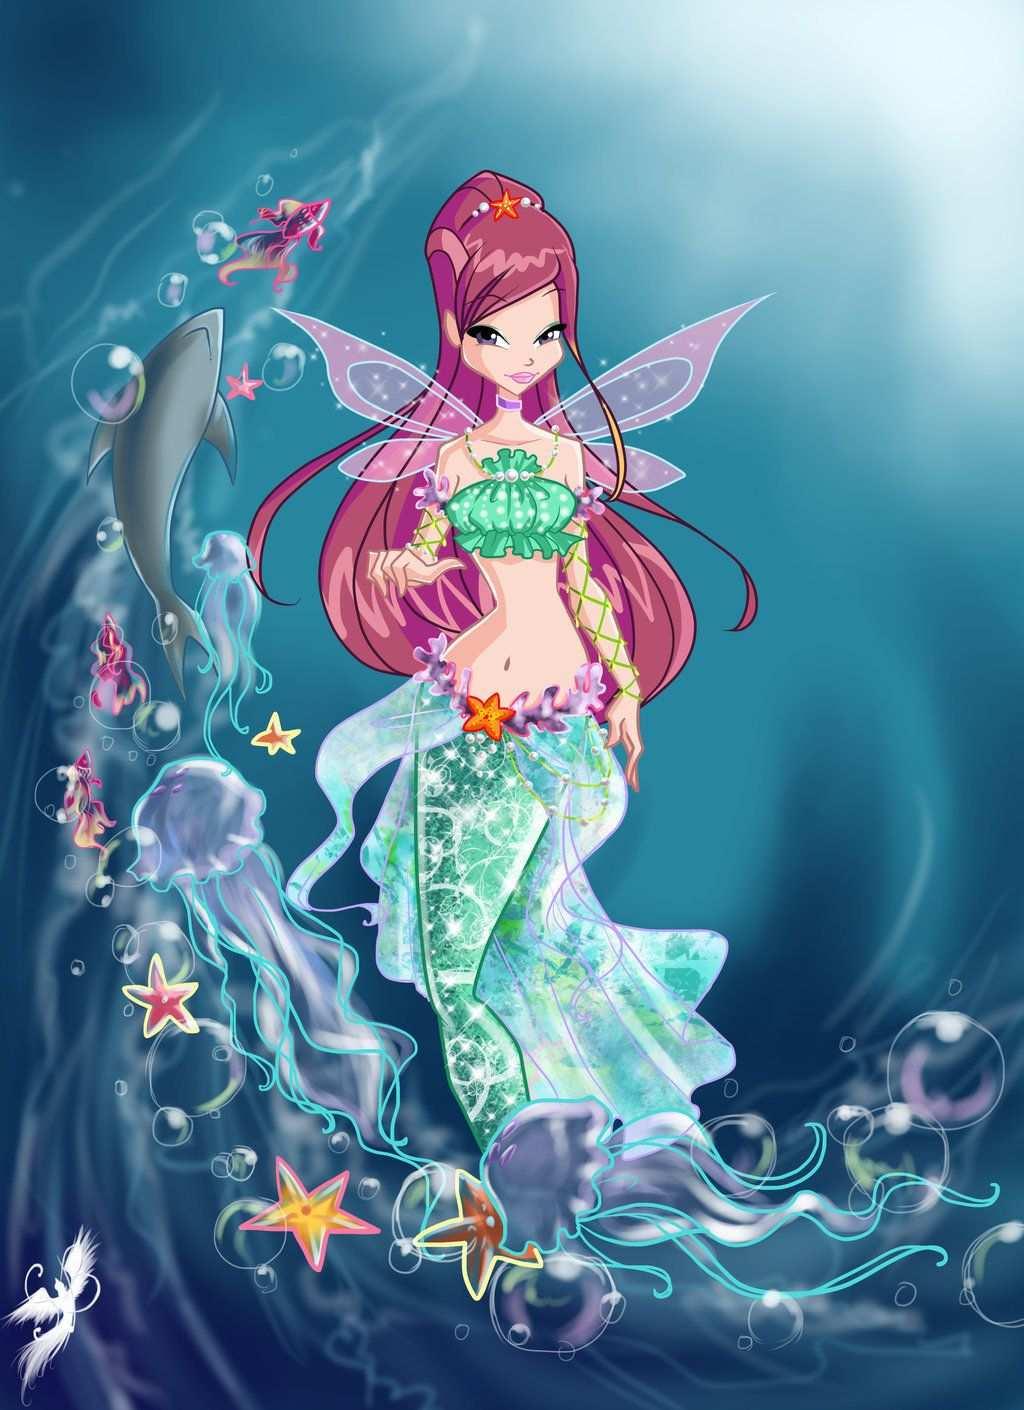 Winx Club Mermaids Kleurplaten Illustraties Grappig